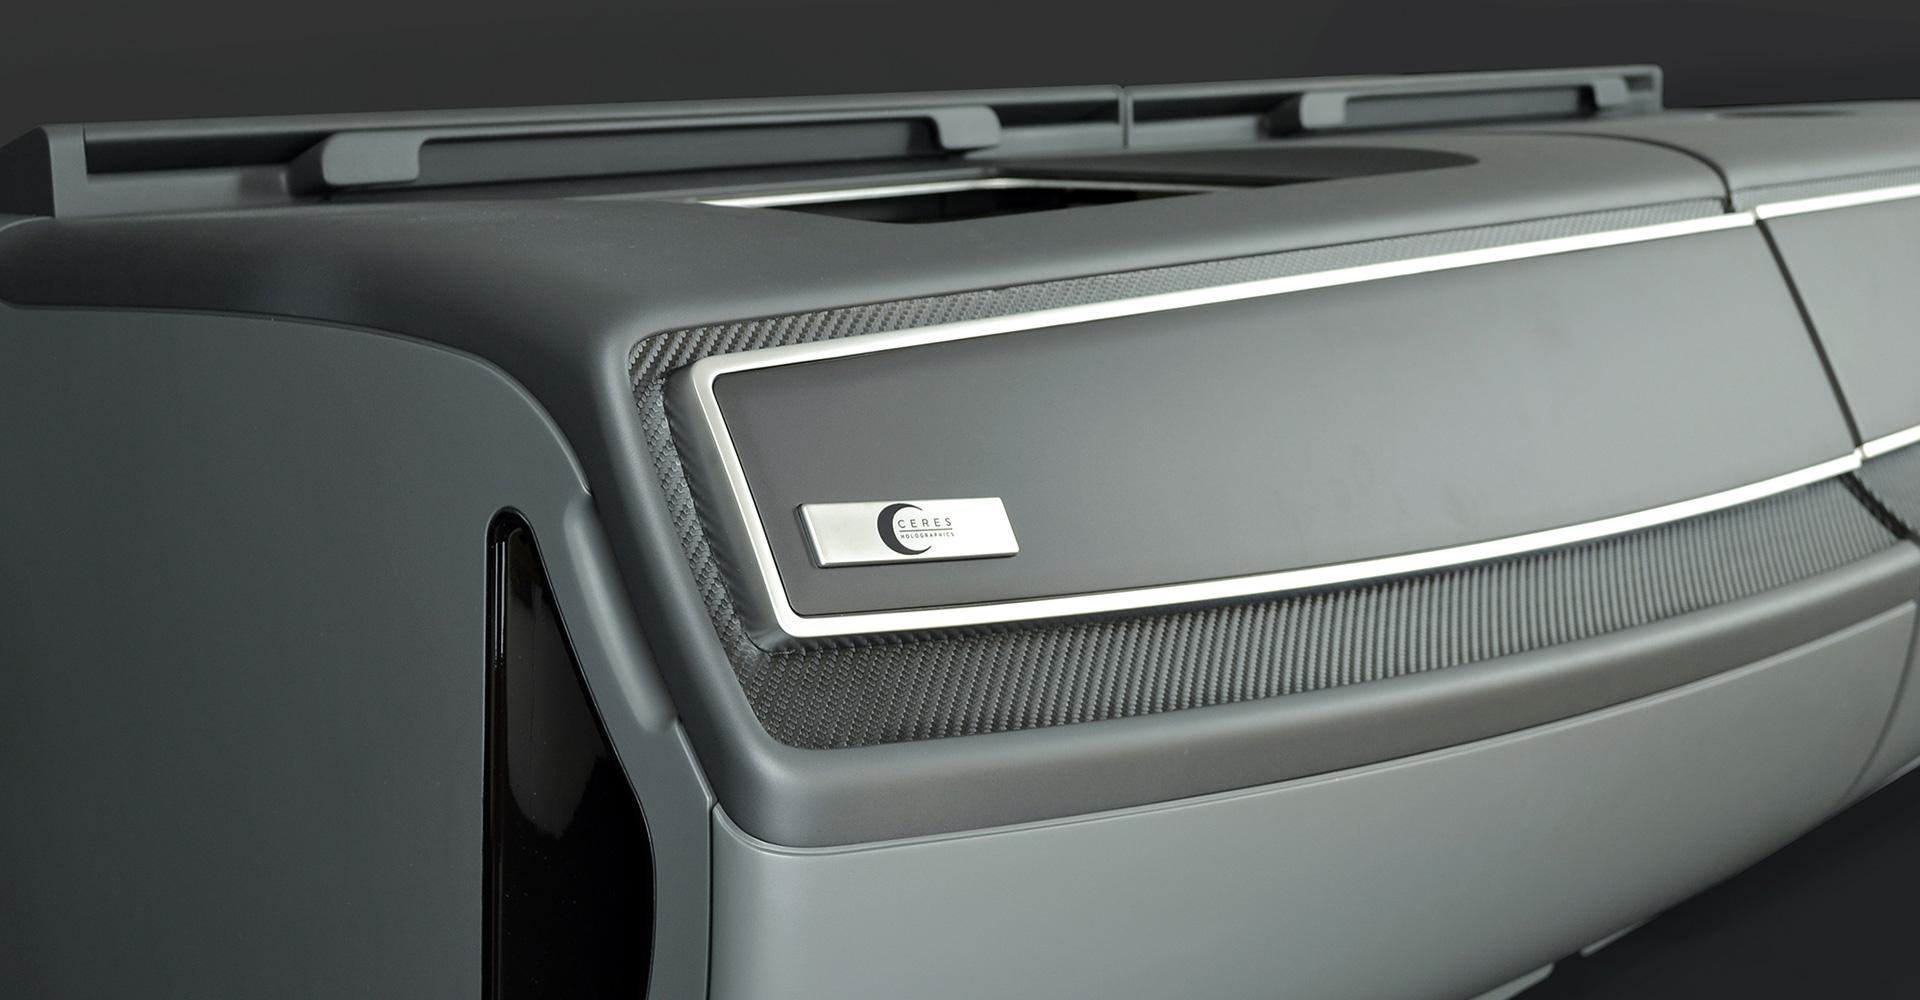 Design Ceres Automotive Holographic Transparent Display System